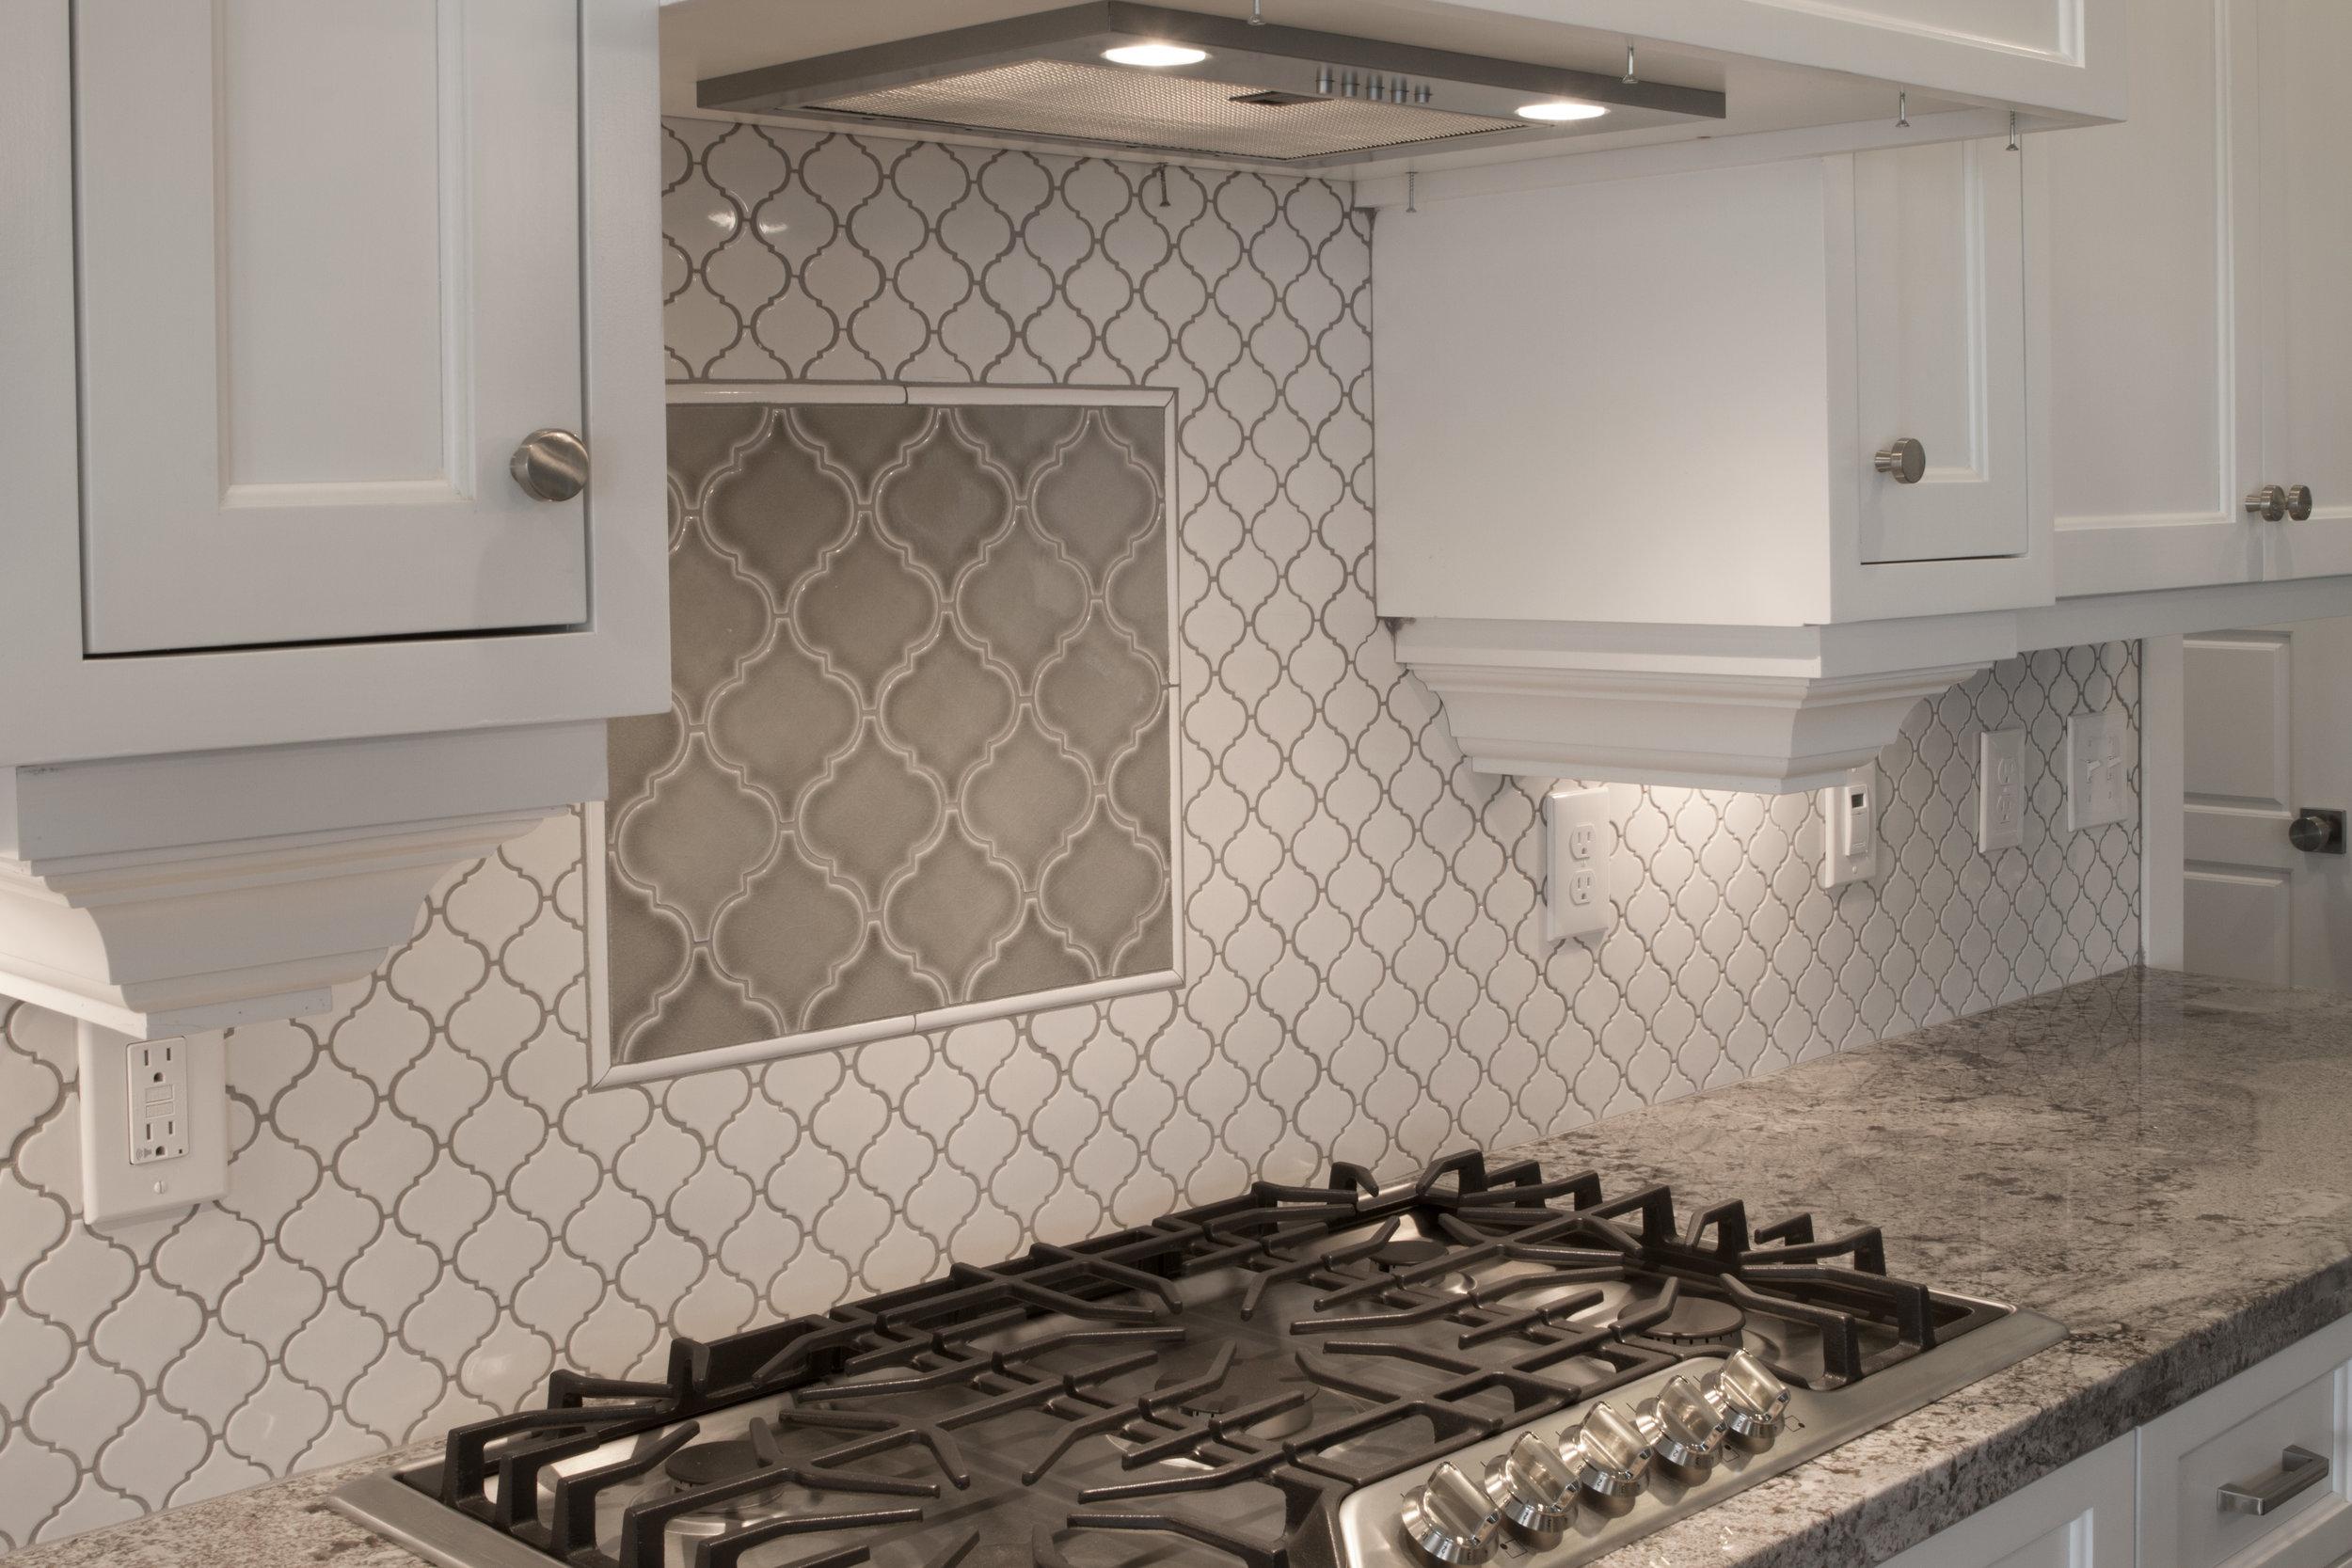 Delicieux New Kitchen U0026 Bathroom Tile Backsplash Installation   Rigby